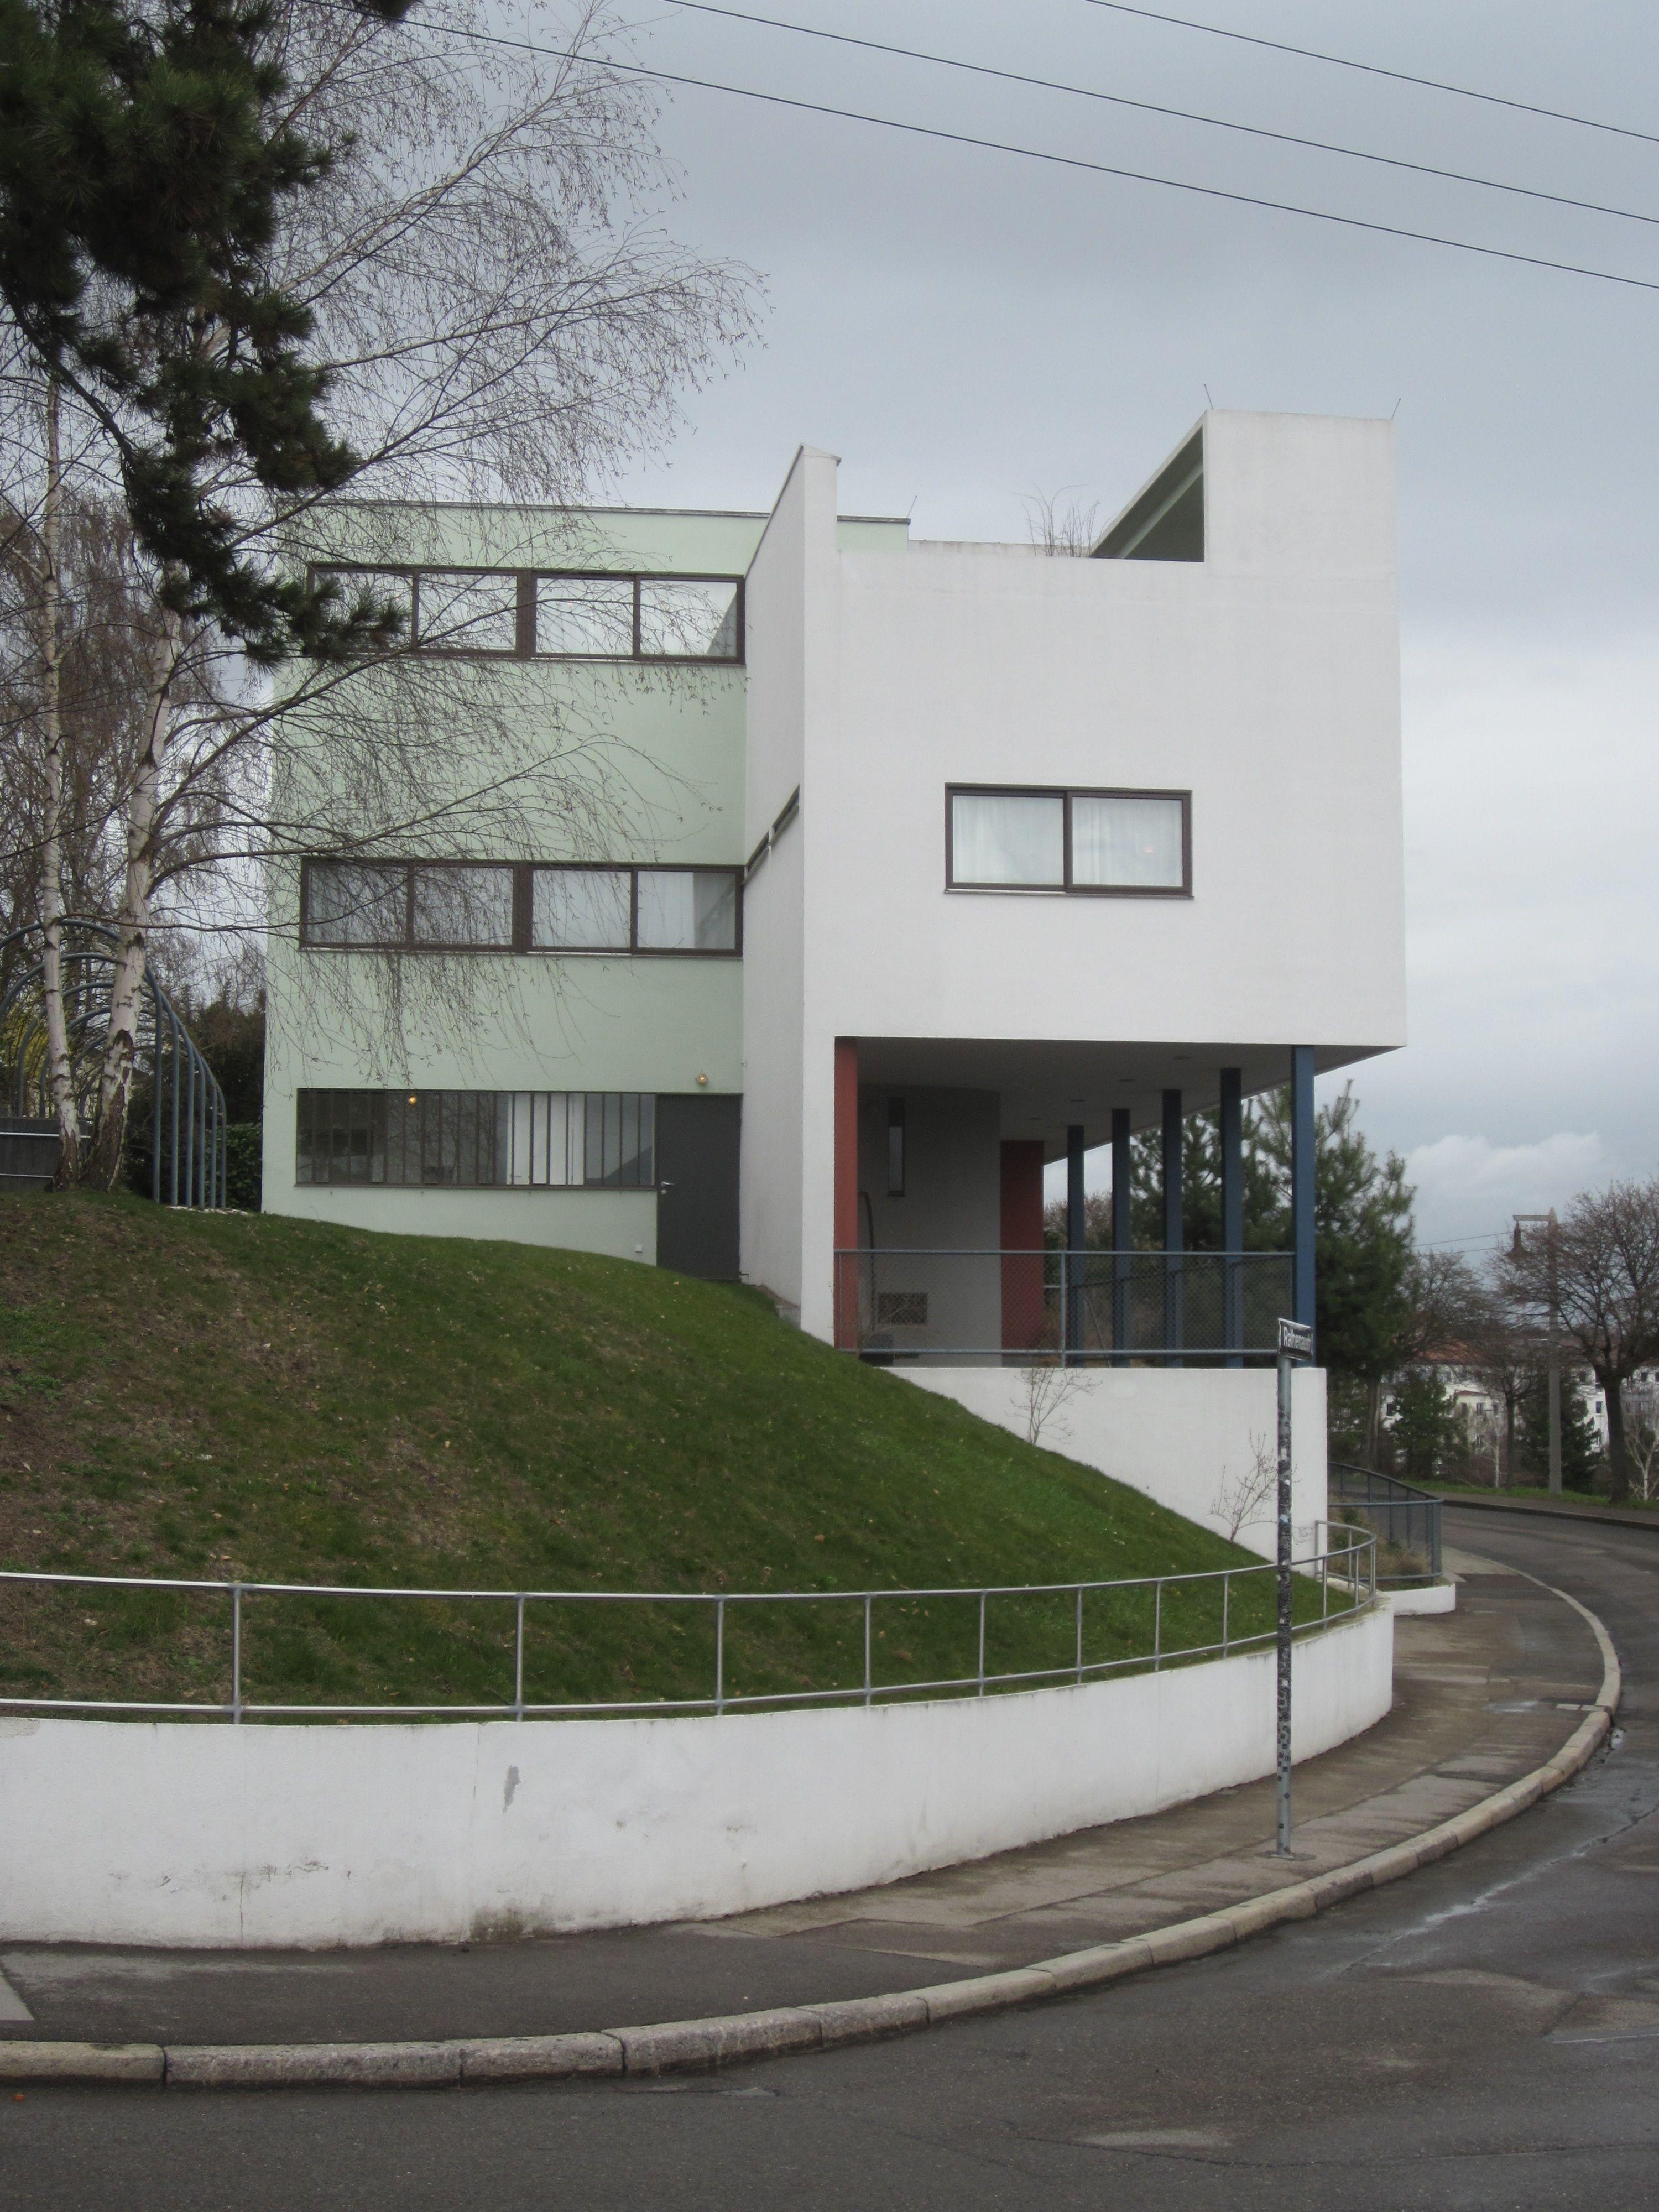 Le Corbusier Weissenhof Estate Bauhaus architecture